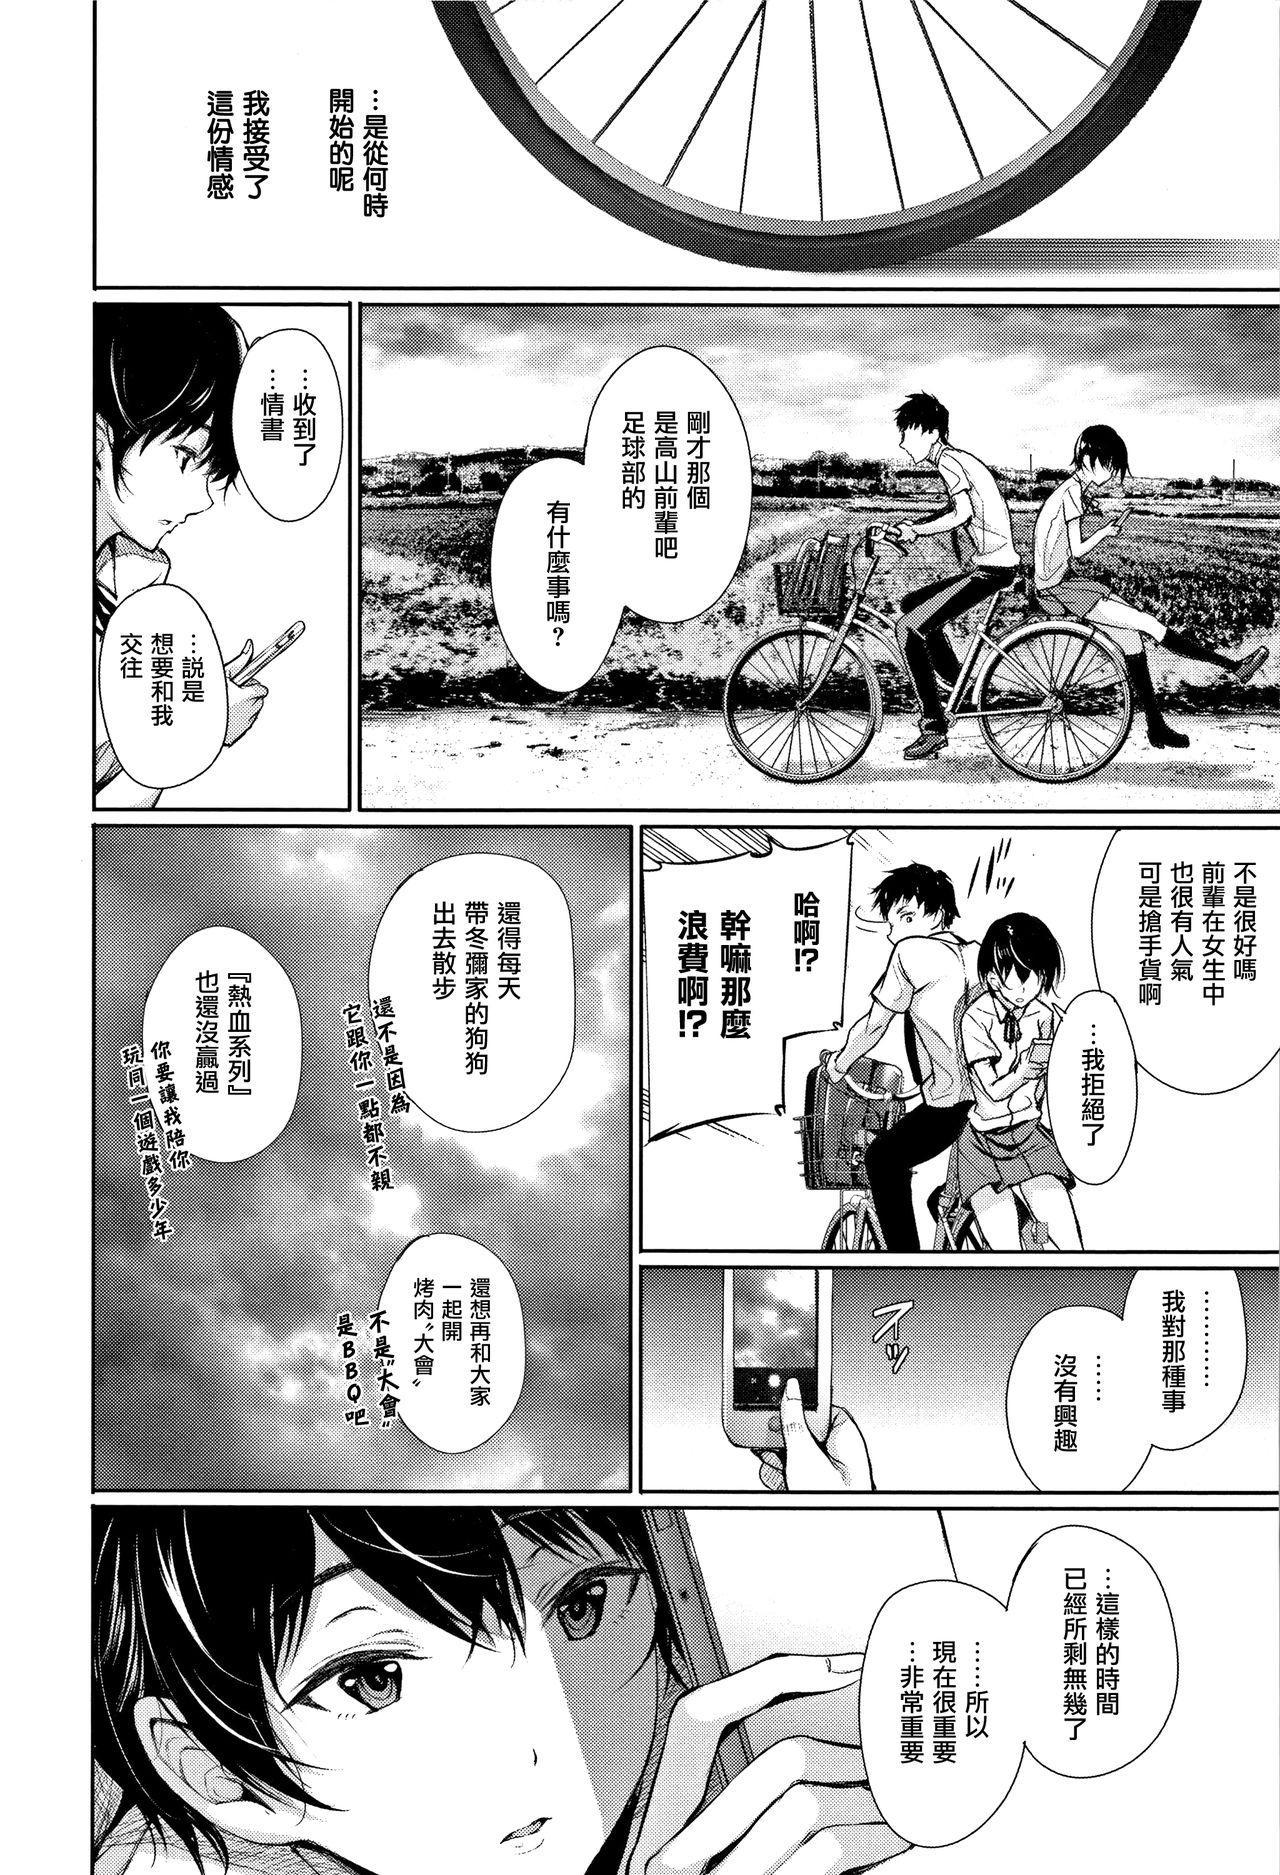 [Gentsuki] Kimi Omou Koi - I think of you. Ch. 1-7 [Chinese] [无毒汉化组] 30